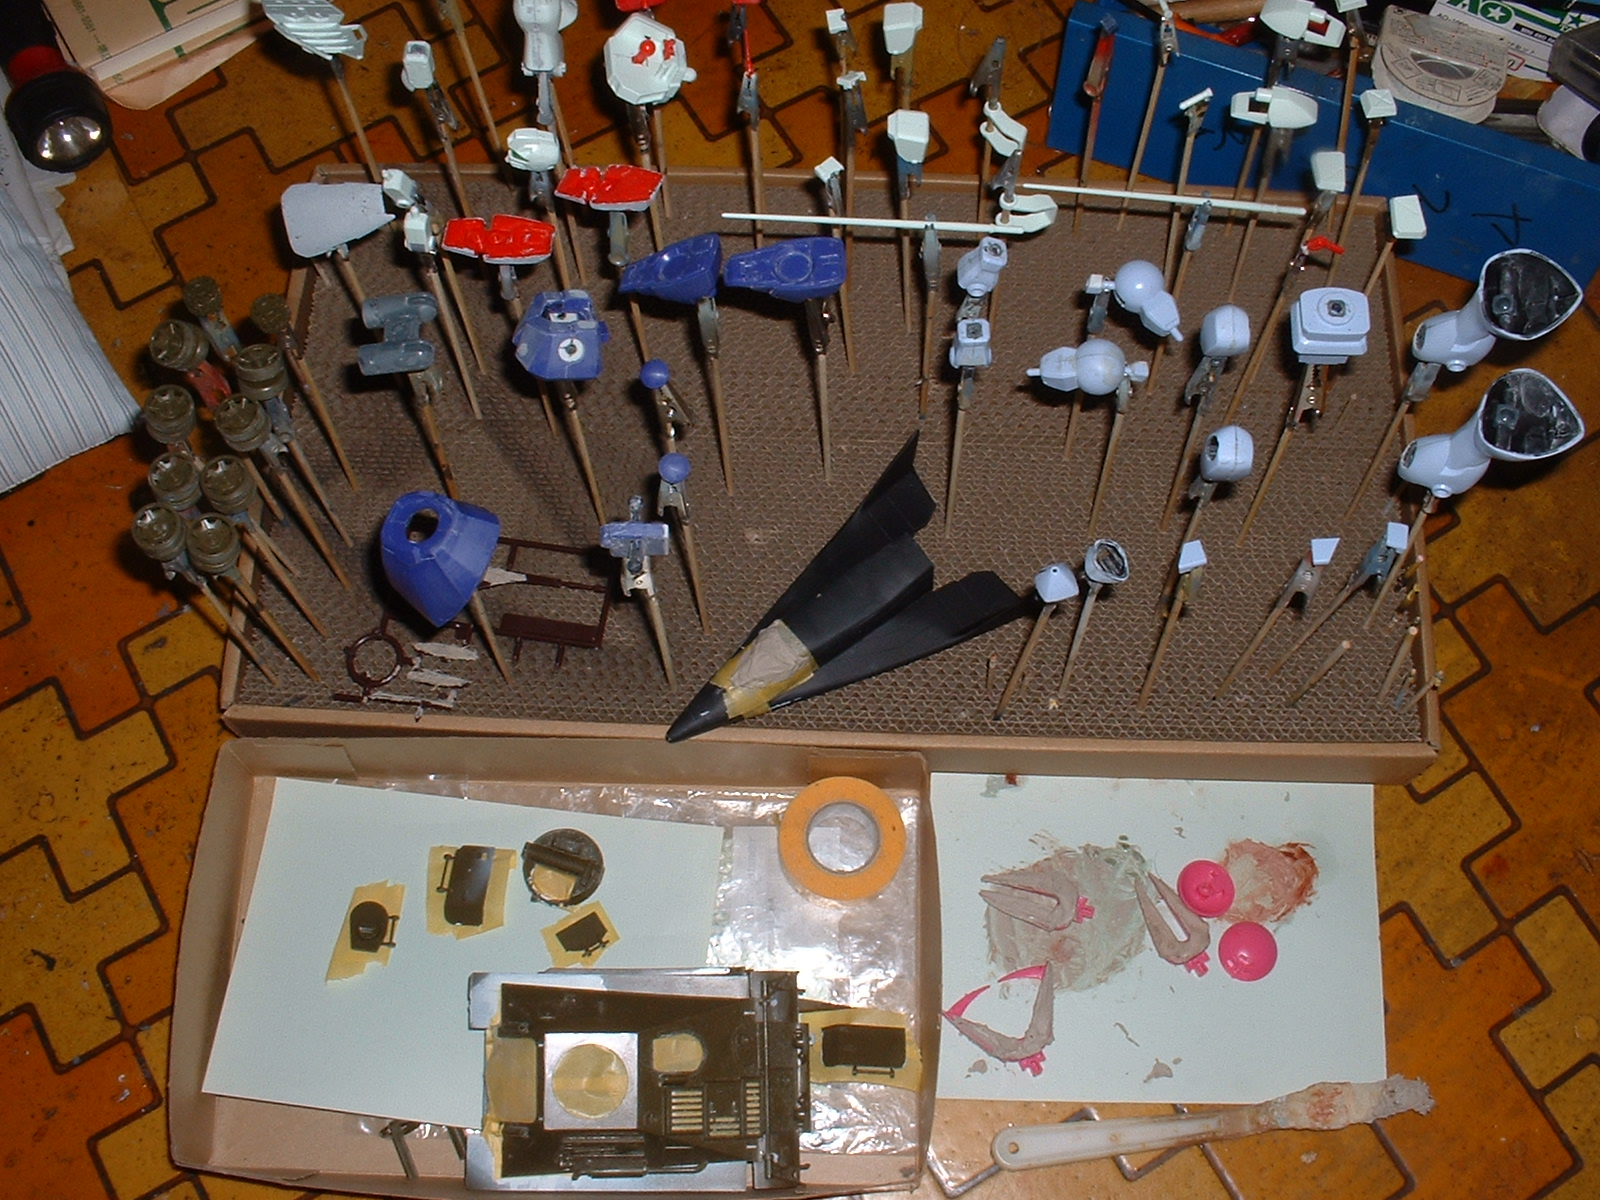 2014年11月23日の模型工作 Doburoku-TAO.JPG